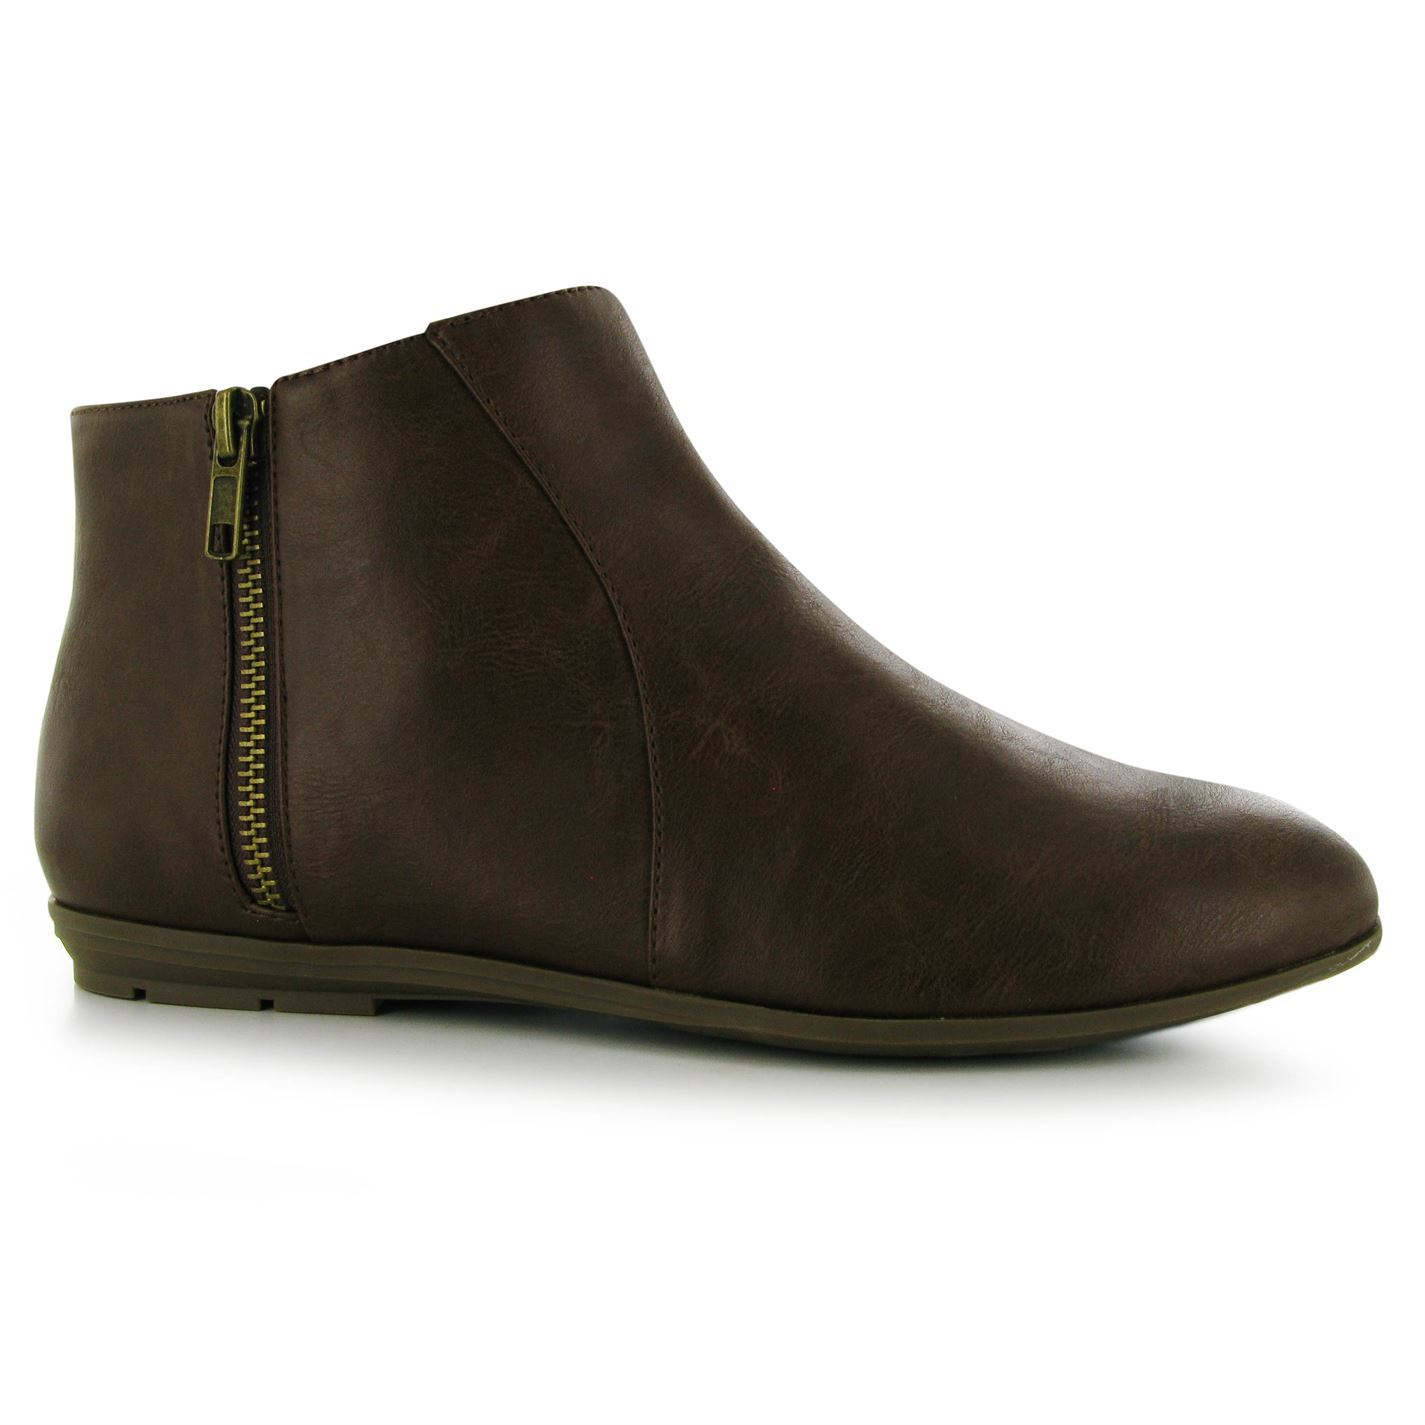 miso womens ladies bijou zip boots lace up flat ankle